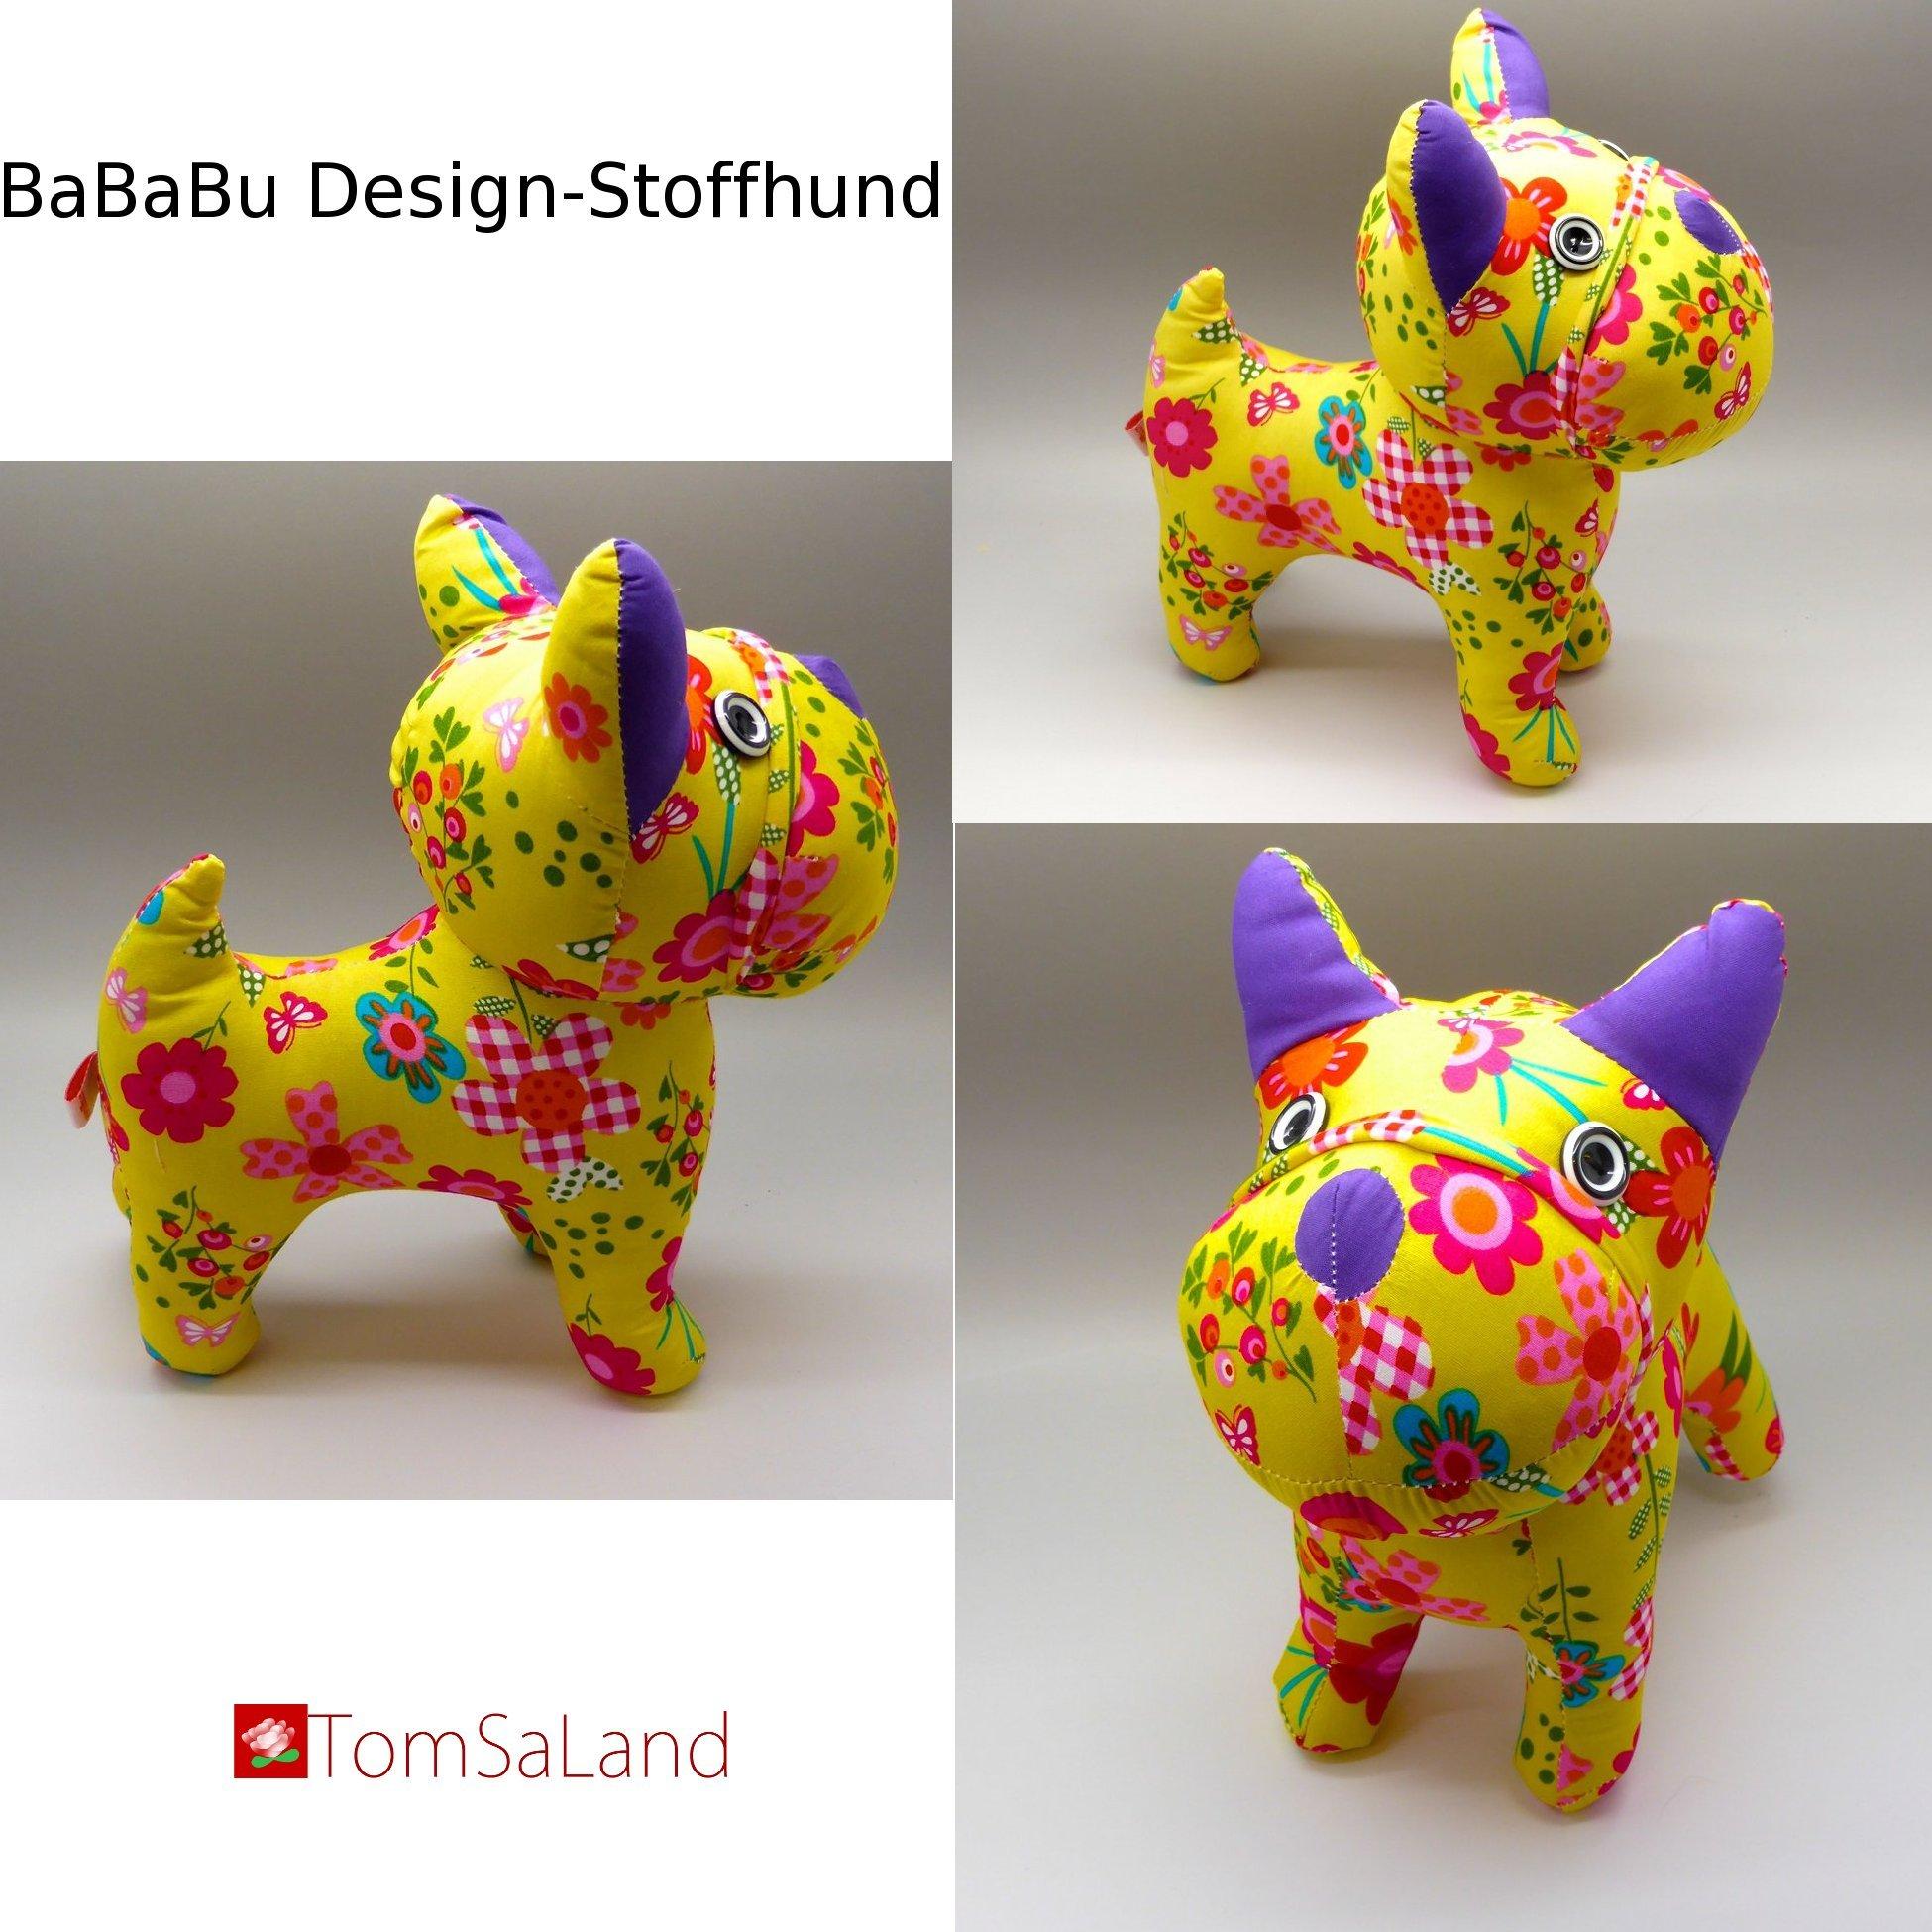 Bababu_Design-Stoffhund_Facebookbilder